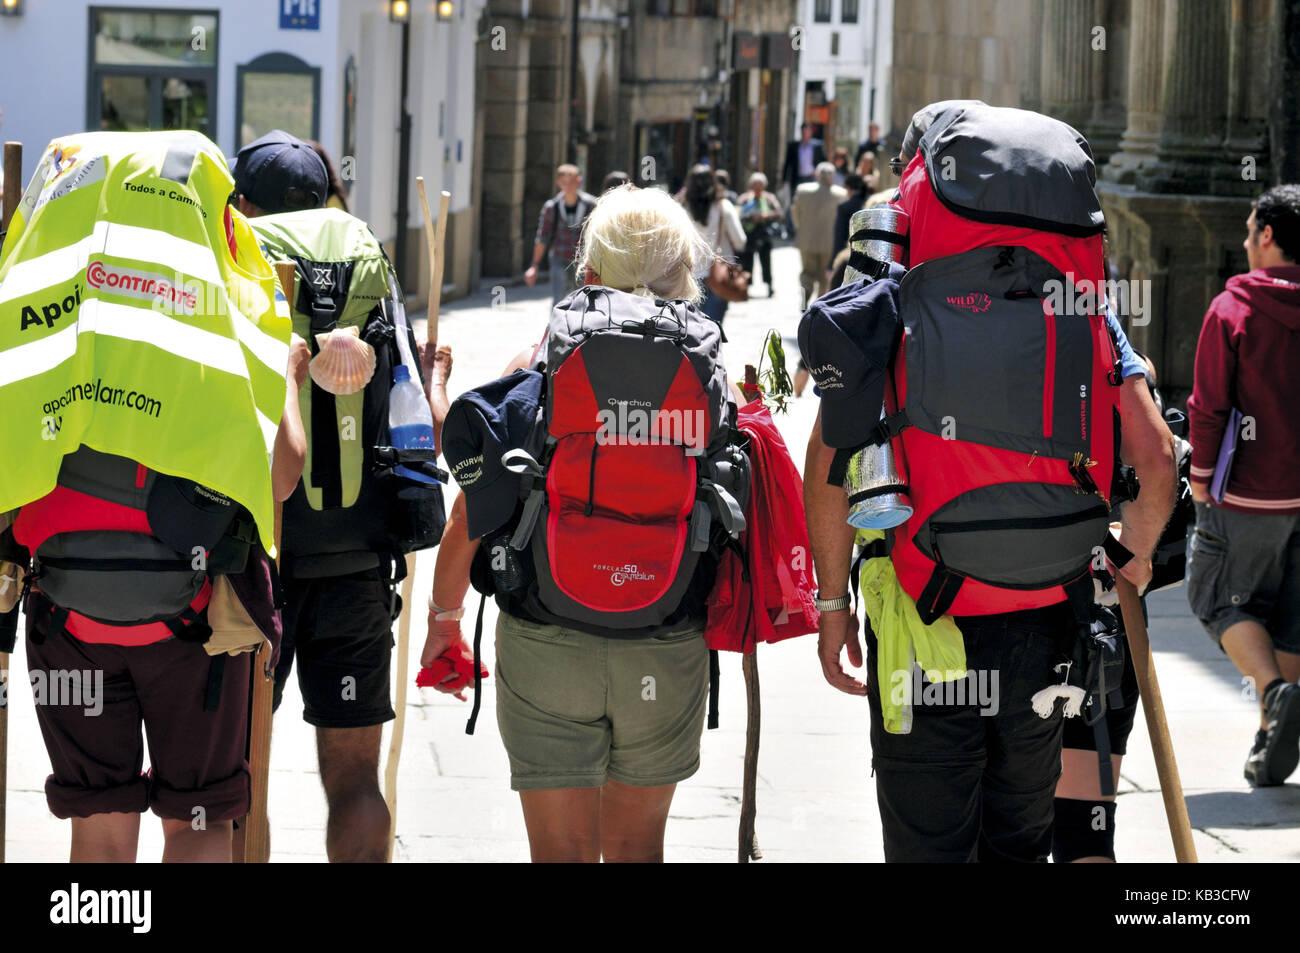 Spain, Way of St. James, jacobean pilgrim on arrival in Santiago de Compostela, - Stock Image